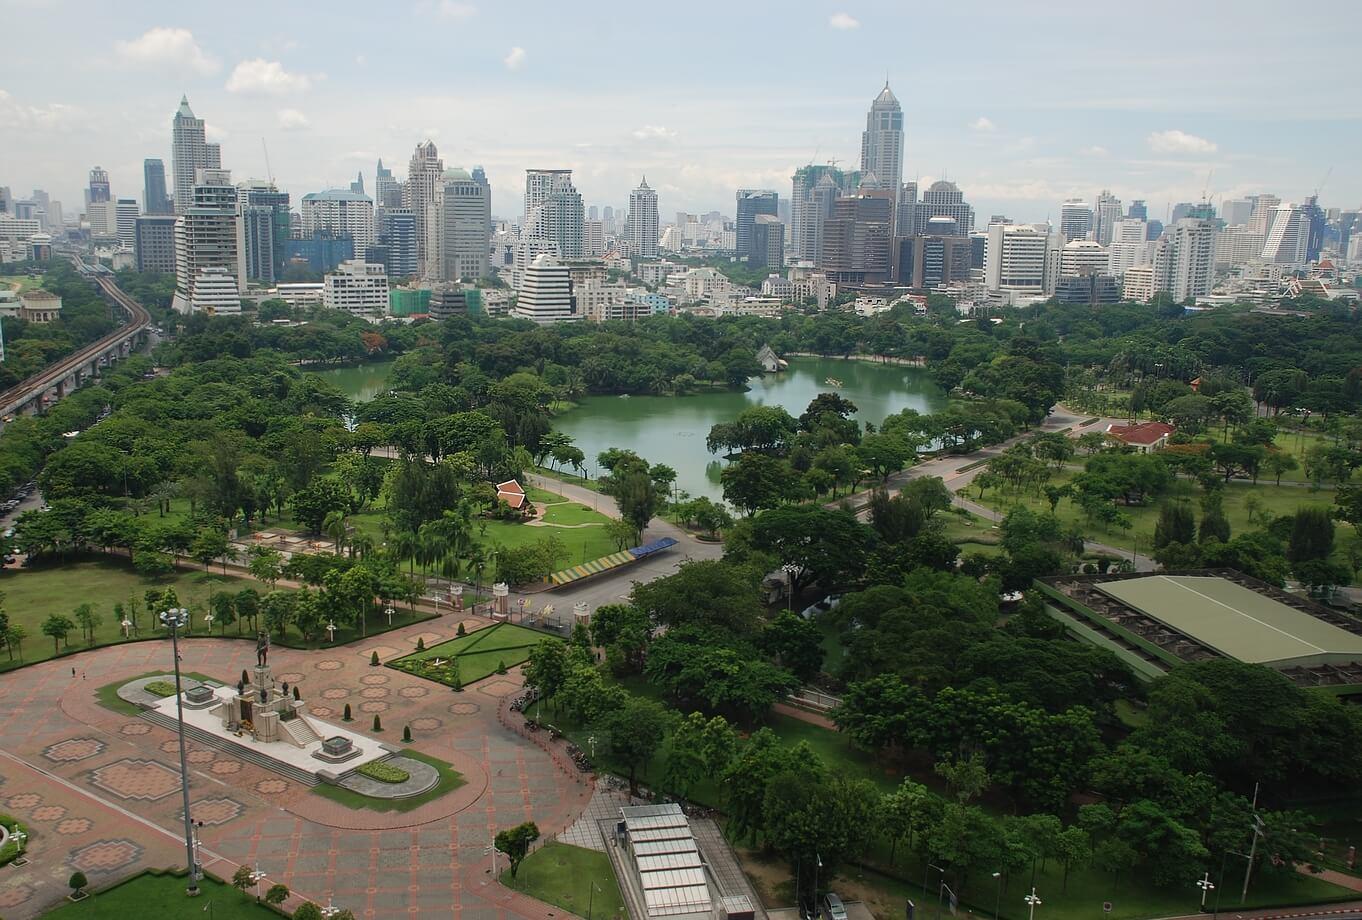 parc lumpini, Bangkok